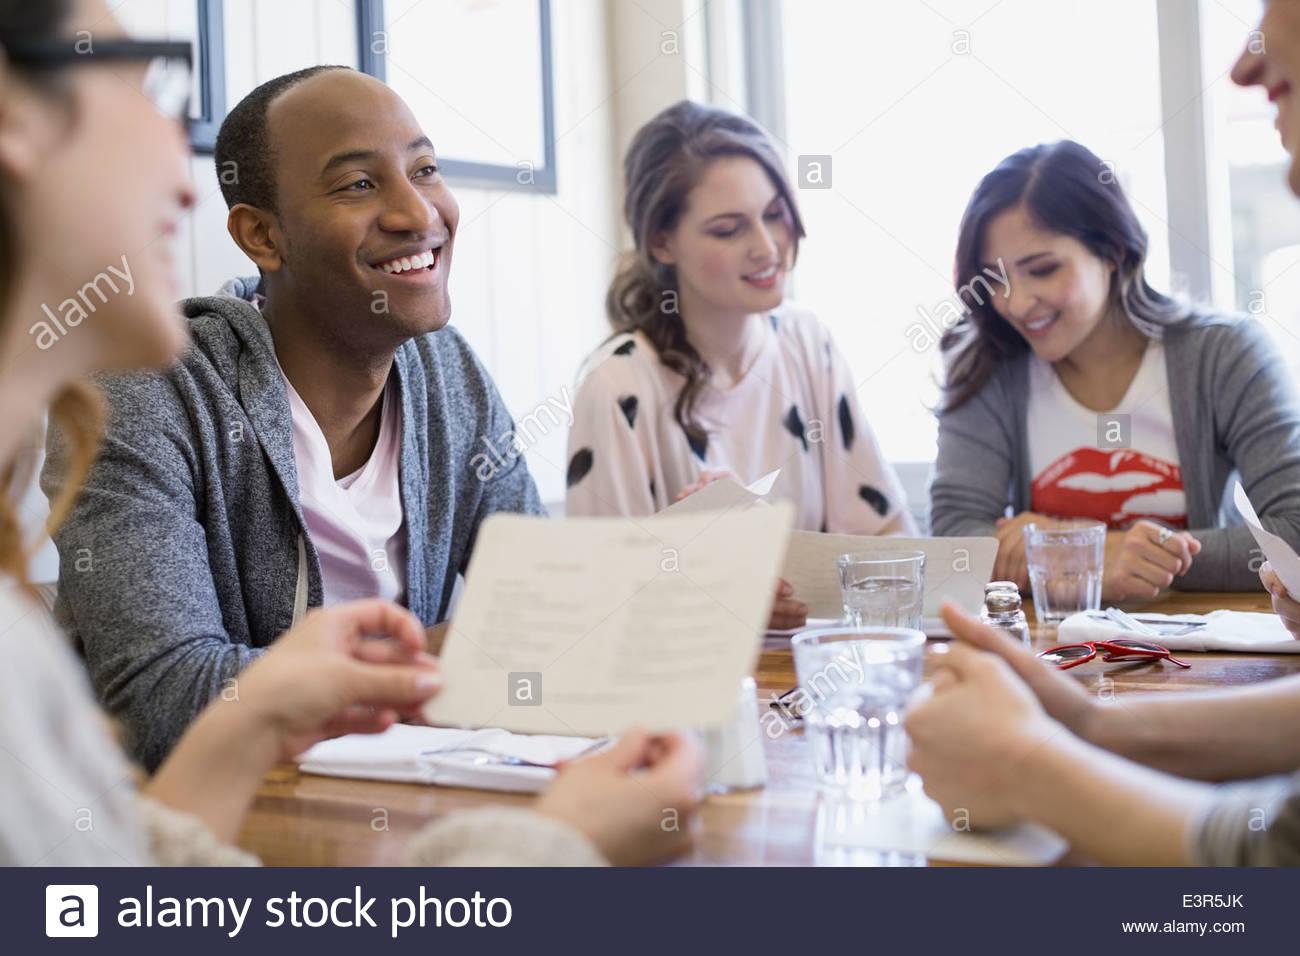 Friends looking at menus in bistro - Stock Image